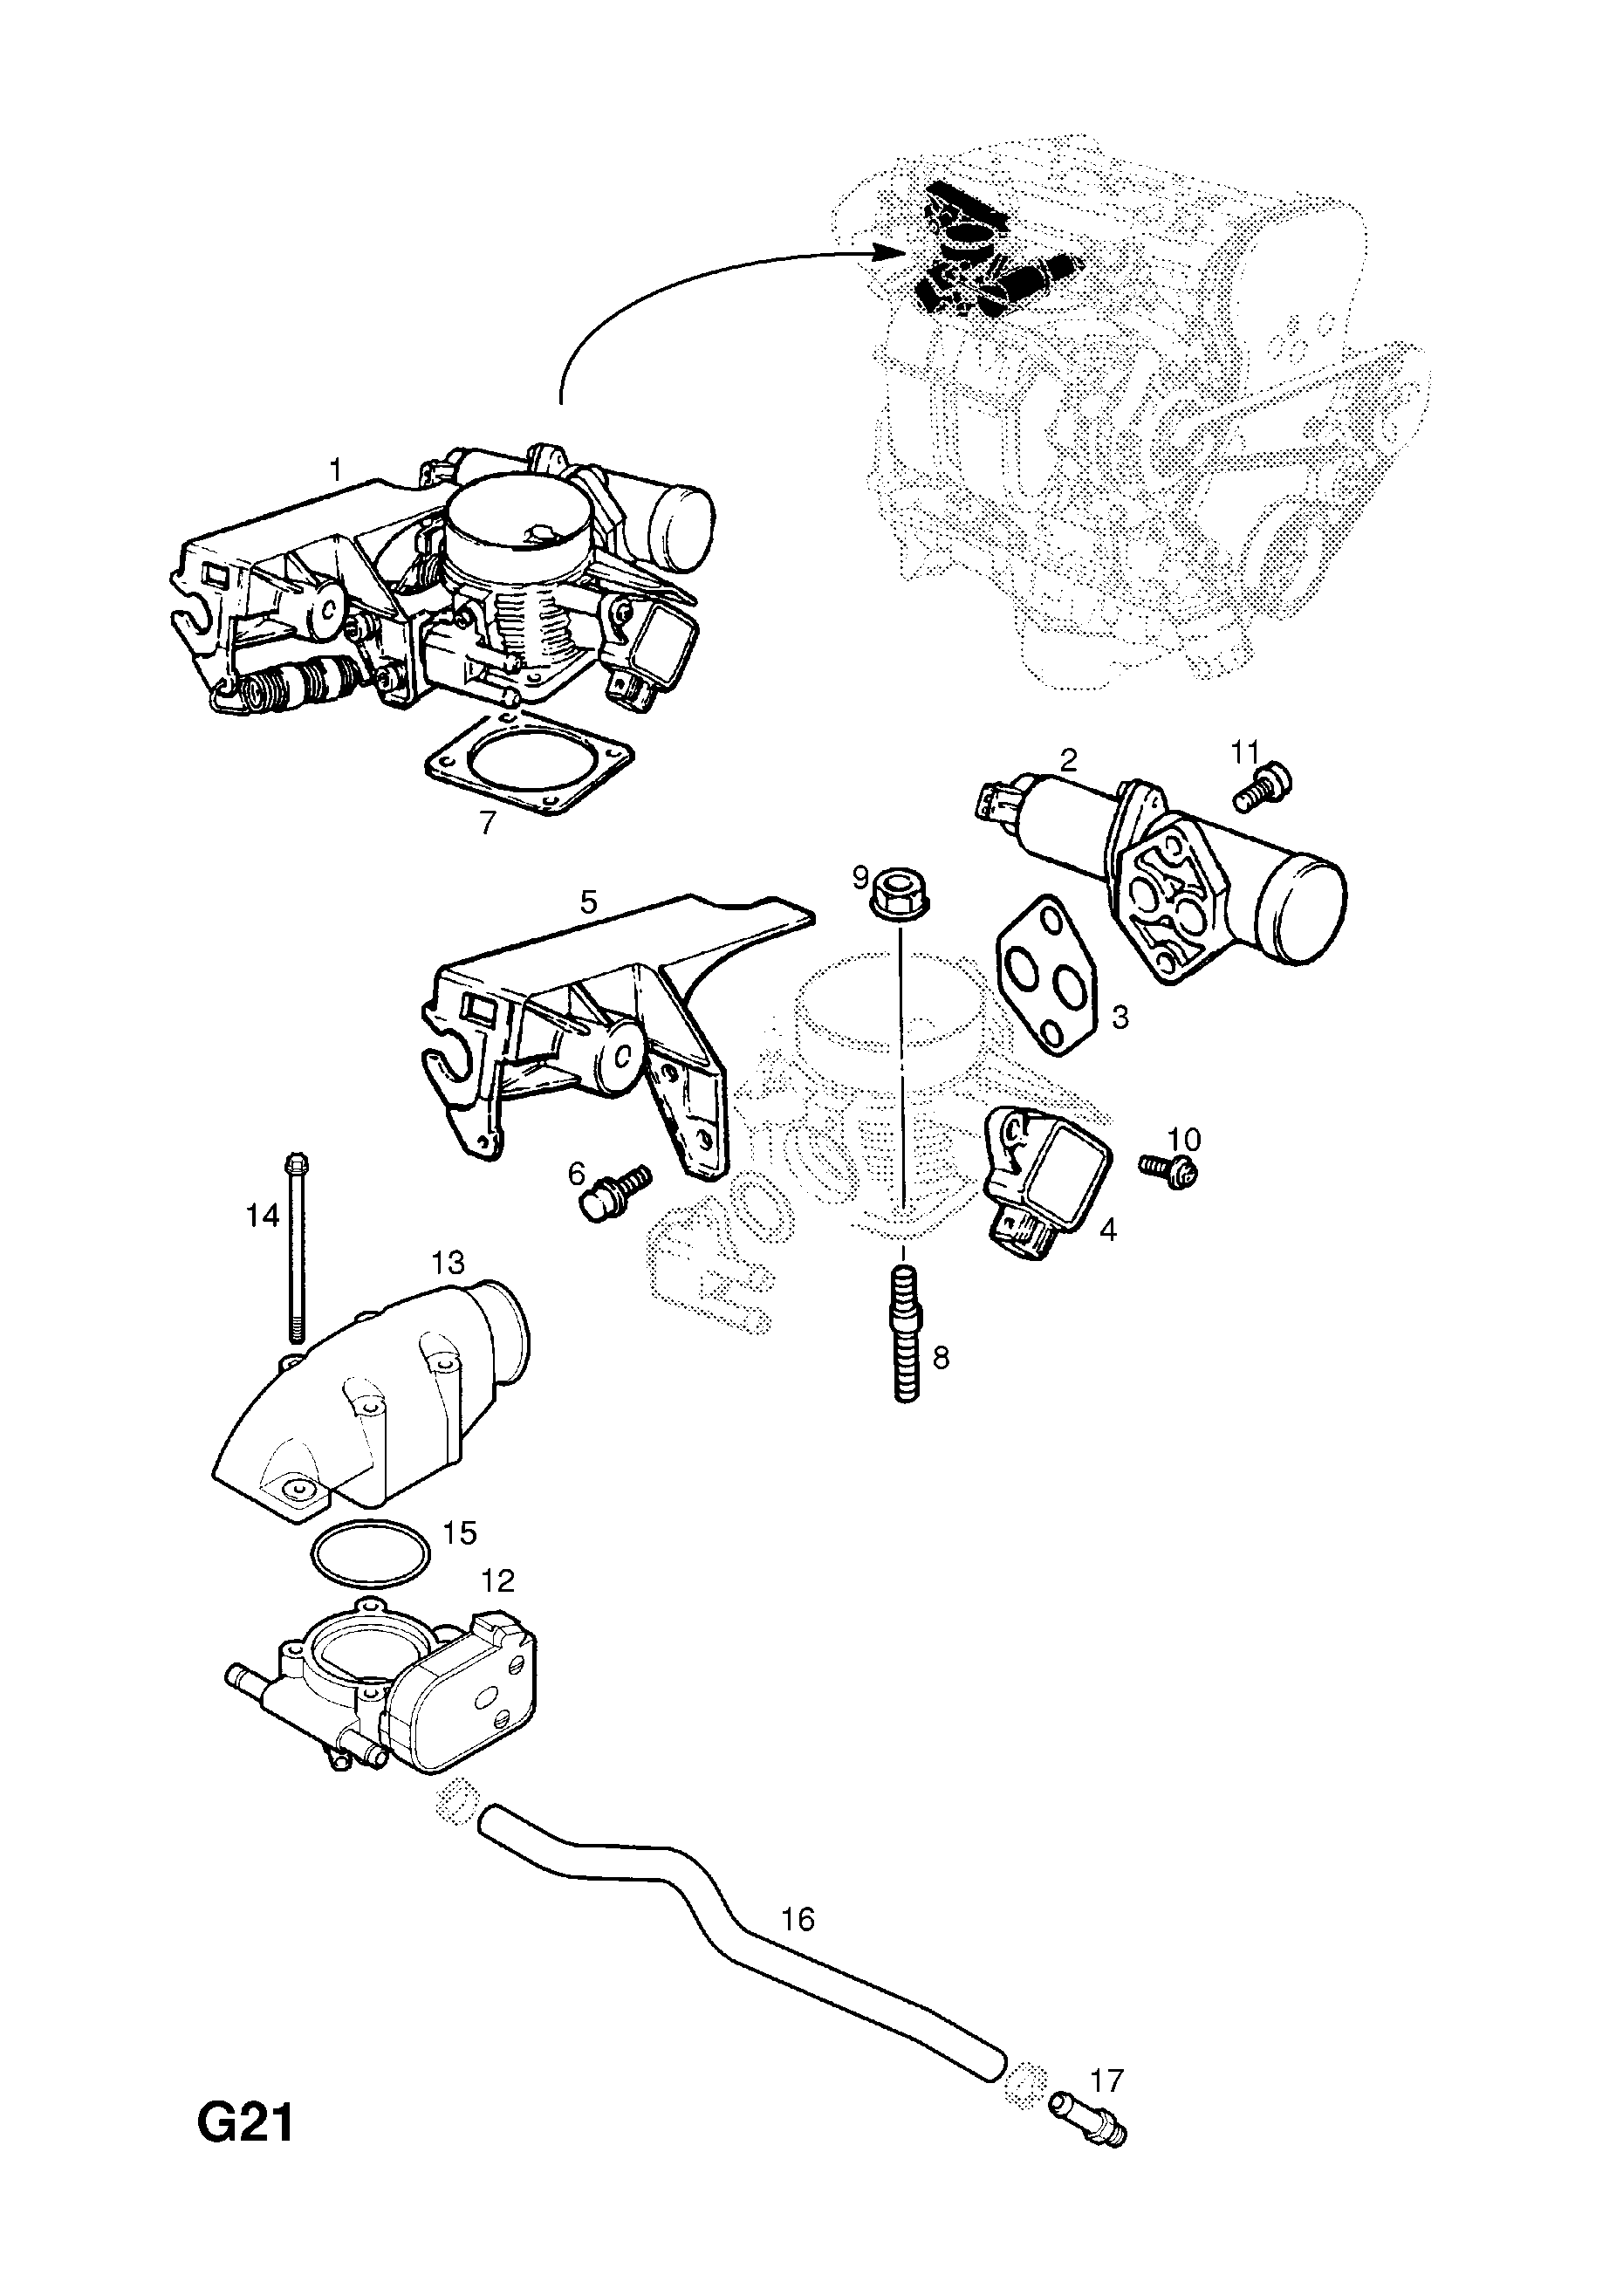 46rh Valve Body Diagram Electrical Wiring Diagrams 518 Explore Schematic U2022